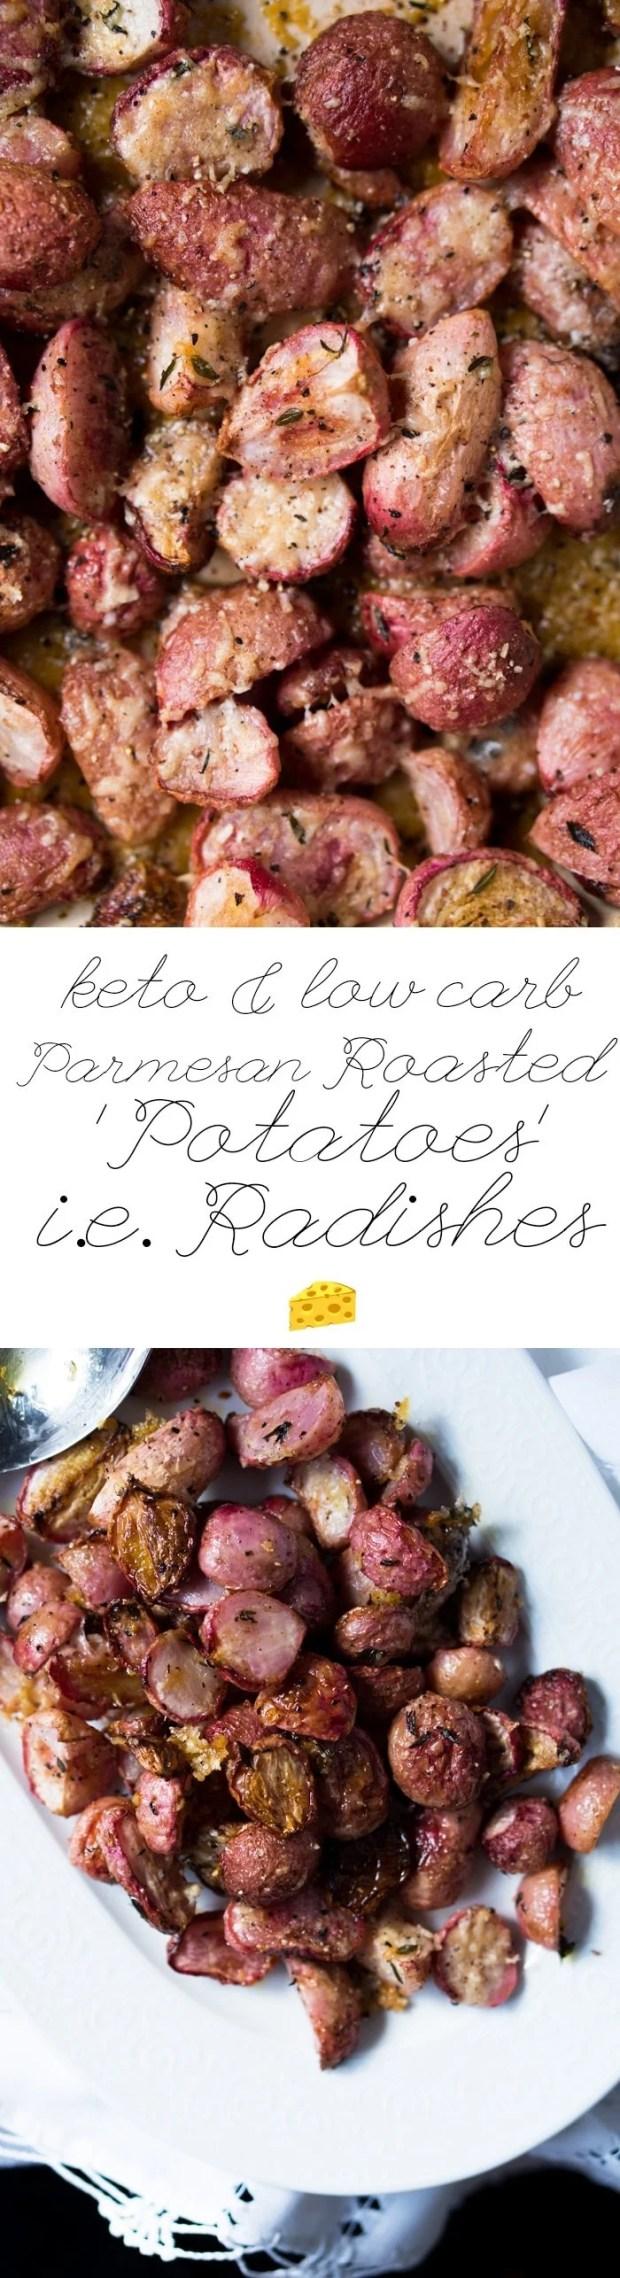 Low Carb & Keto Roasted Radishes; i.e. 'Potatoes' 🧀